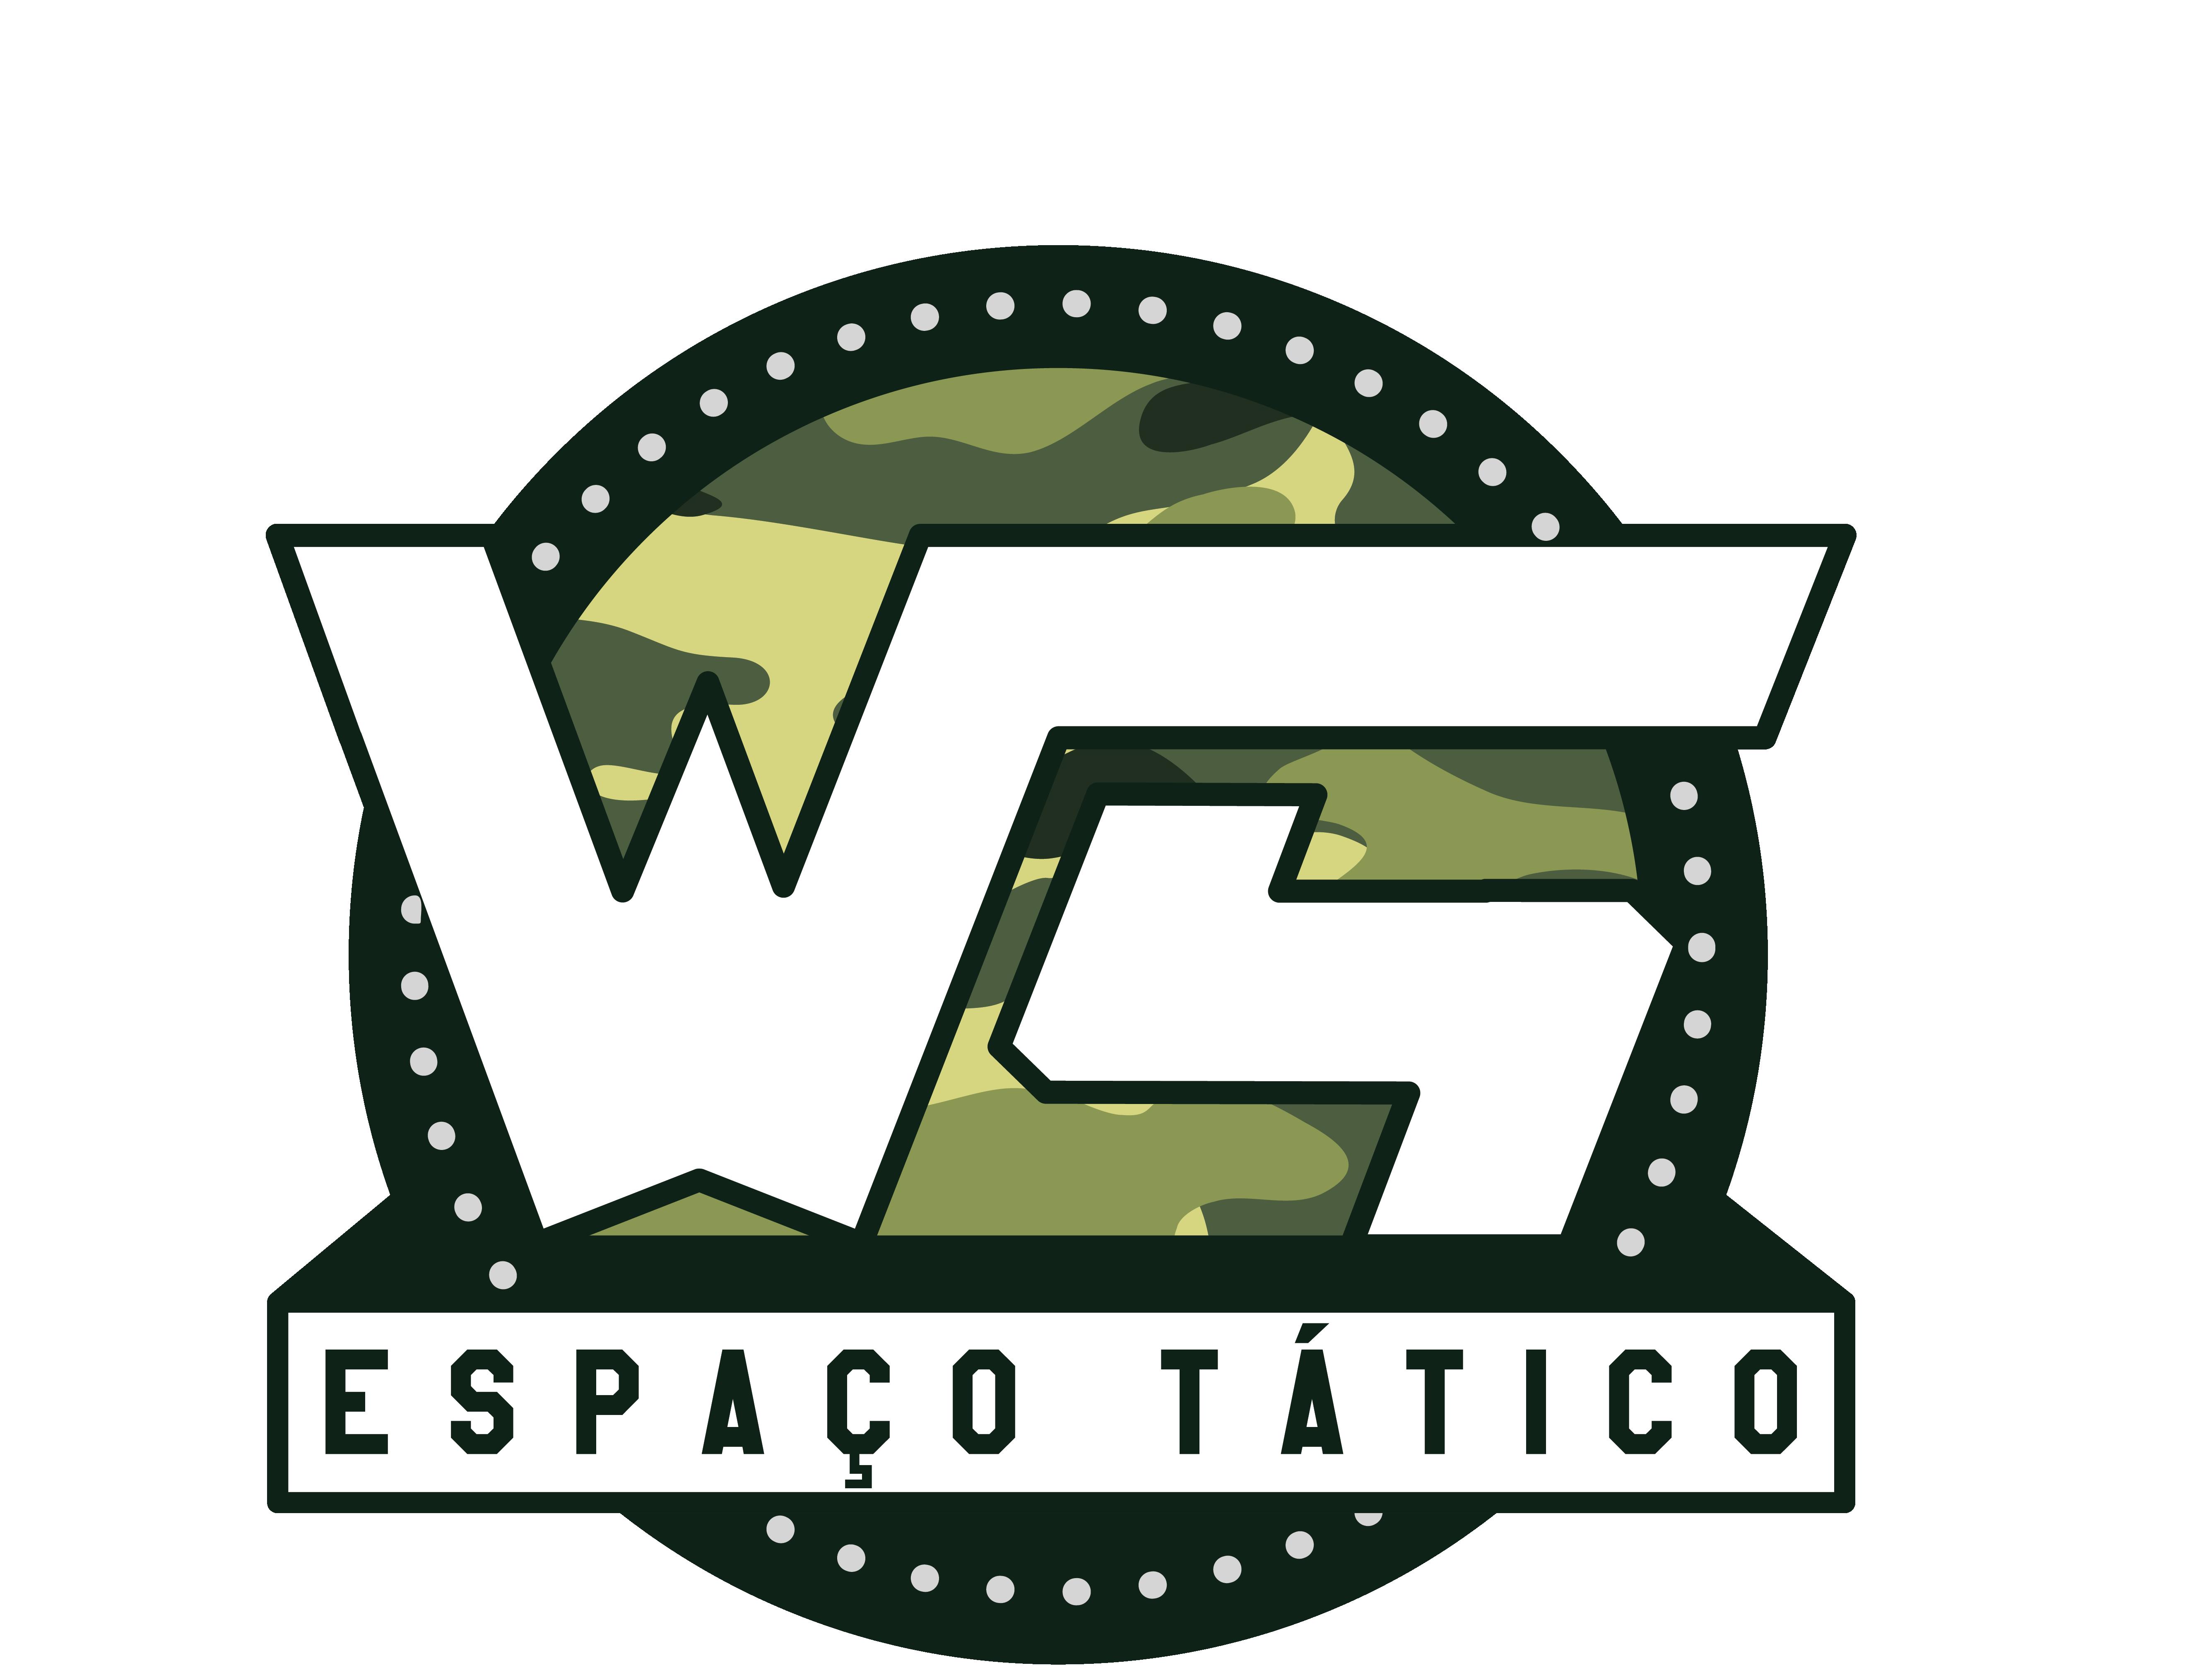 Espaço Tático WS